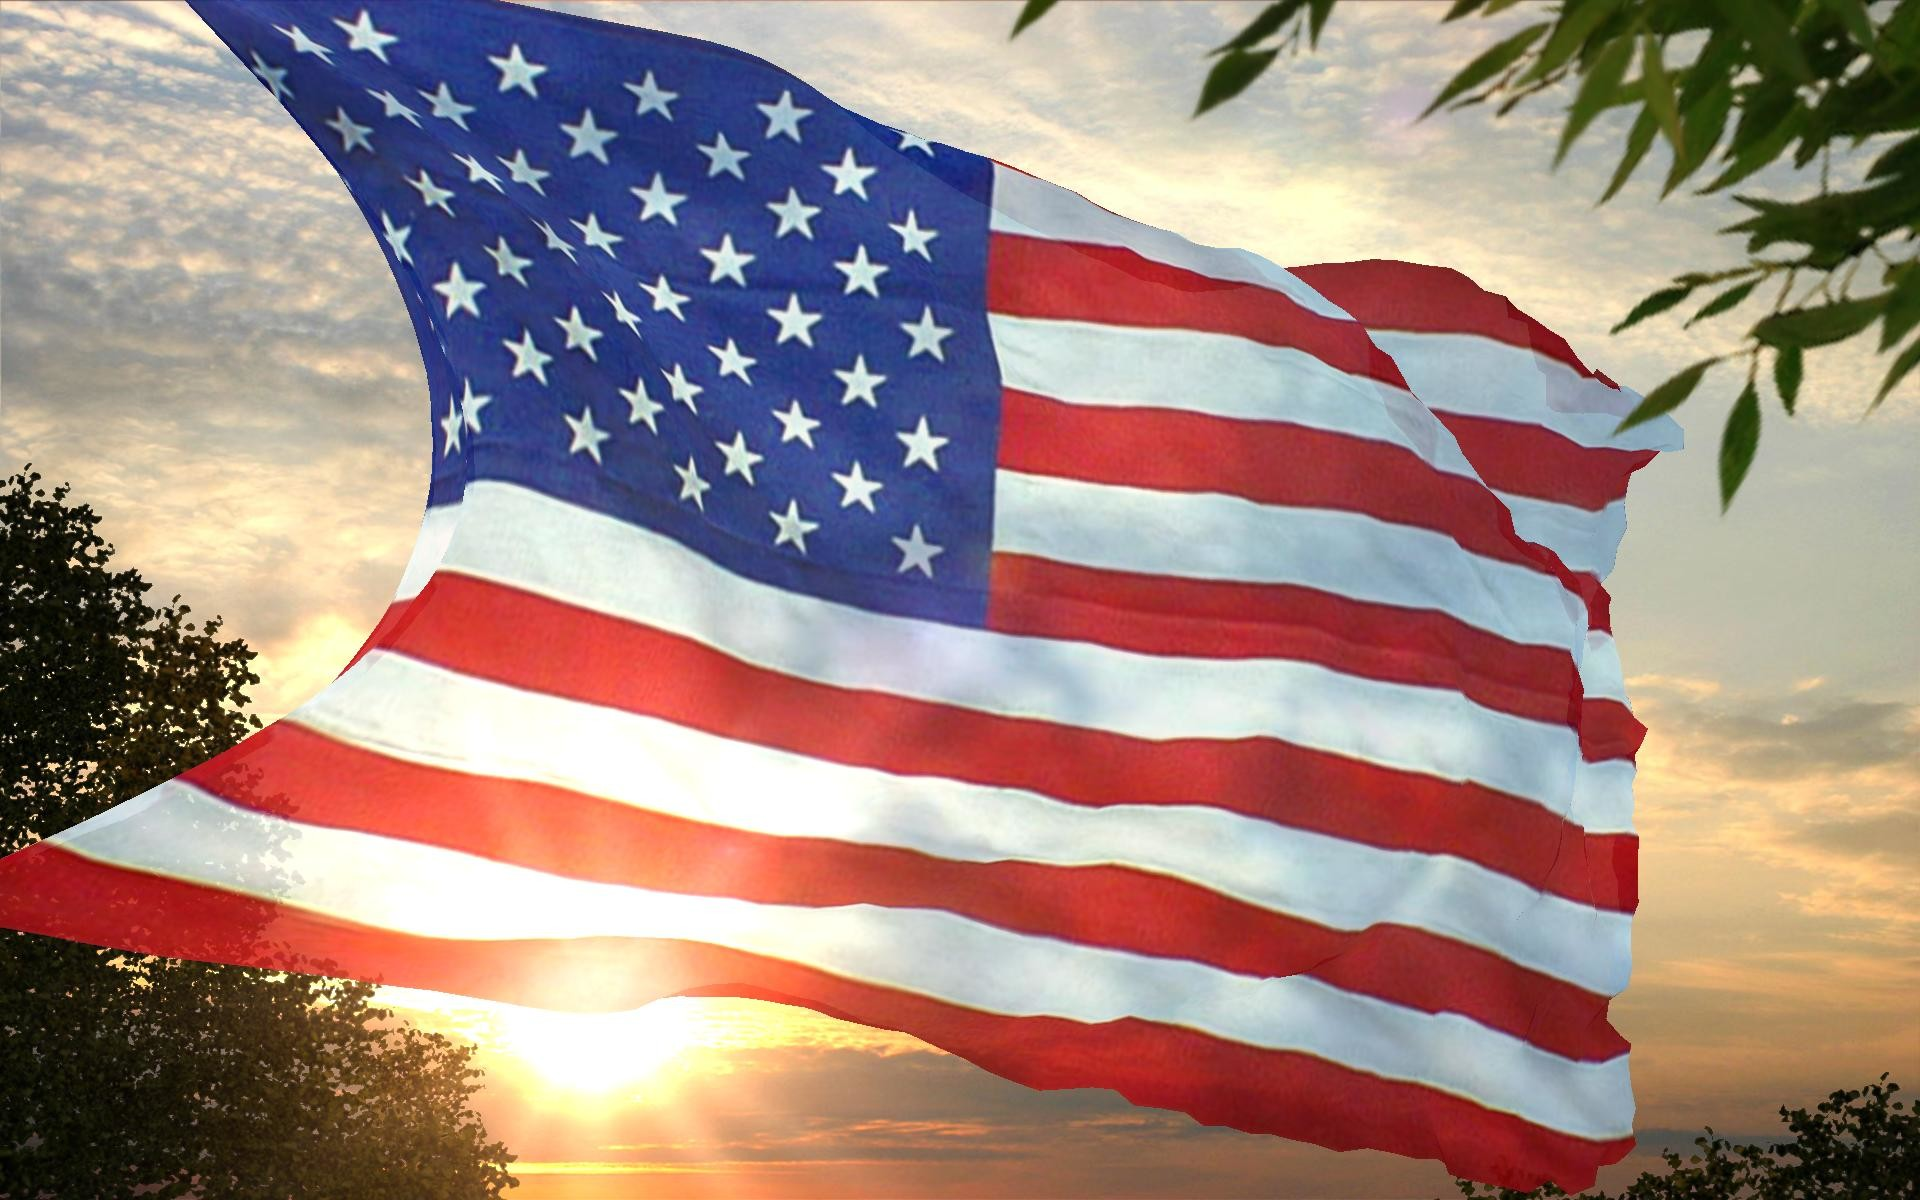 USA American Flag Wallpaper #13065 Wallpaper | Cool Walldiskpaper.com